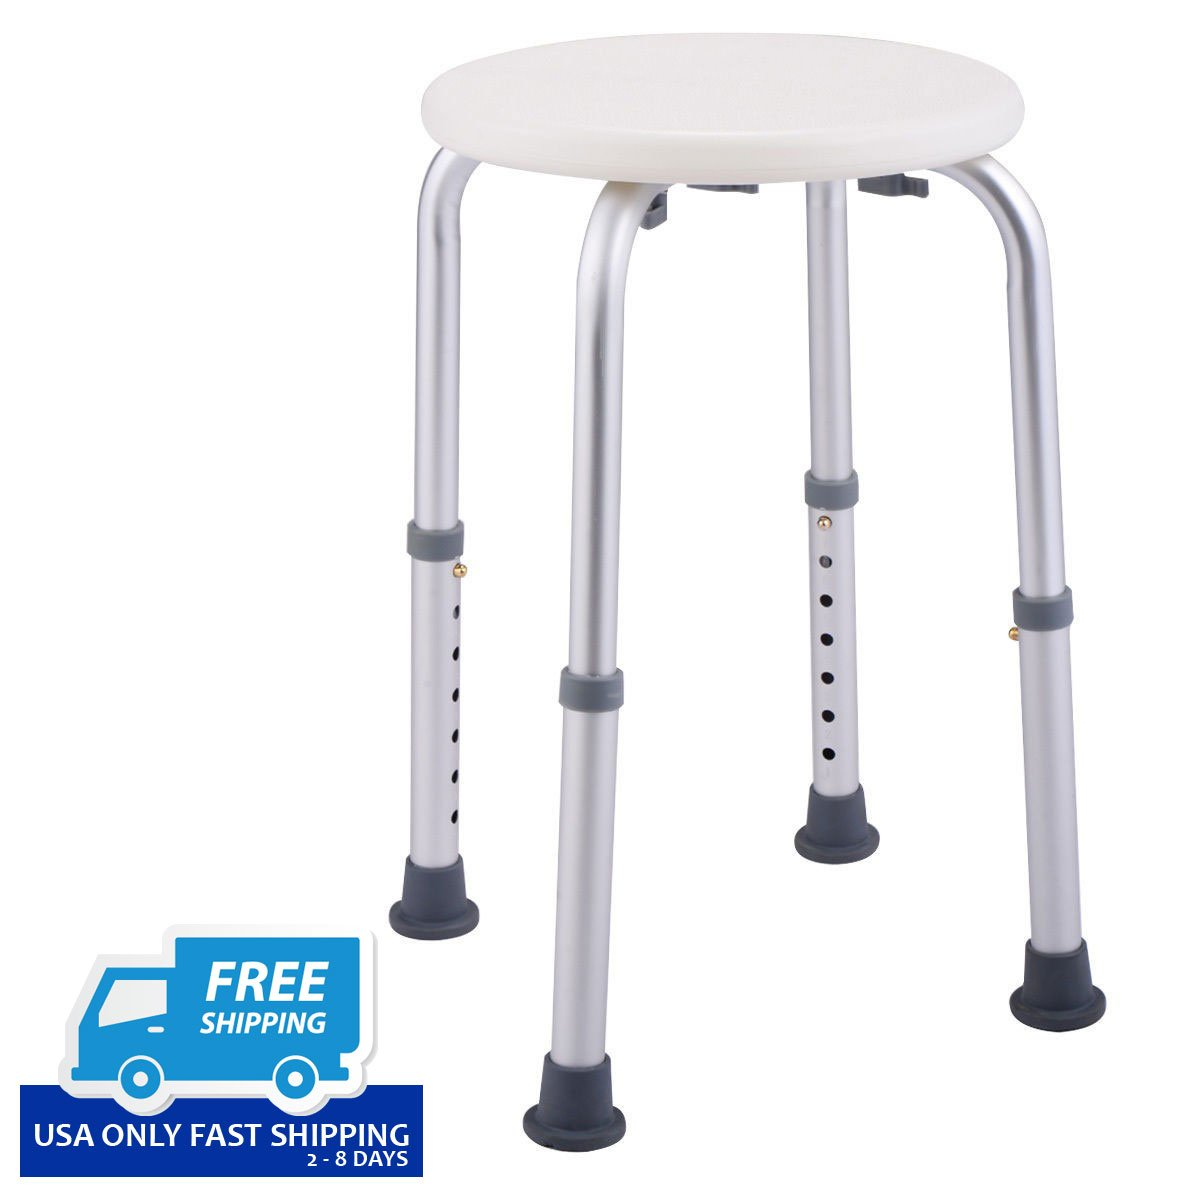 7 Height Adjustable Bath Shower Chair Medical Seat Stool Bath Tub ...